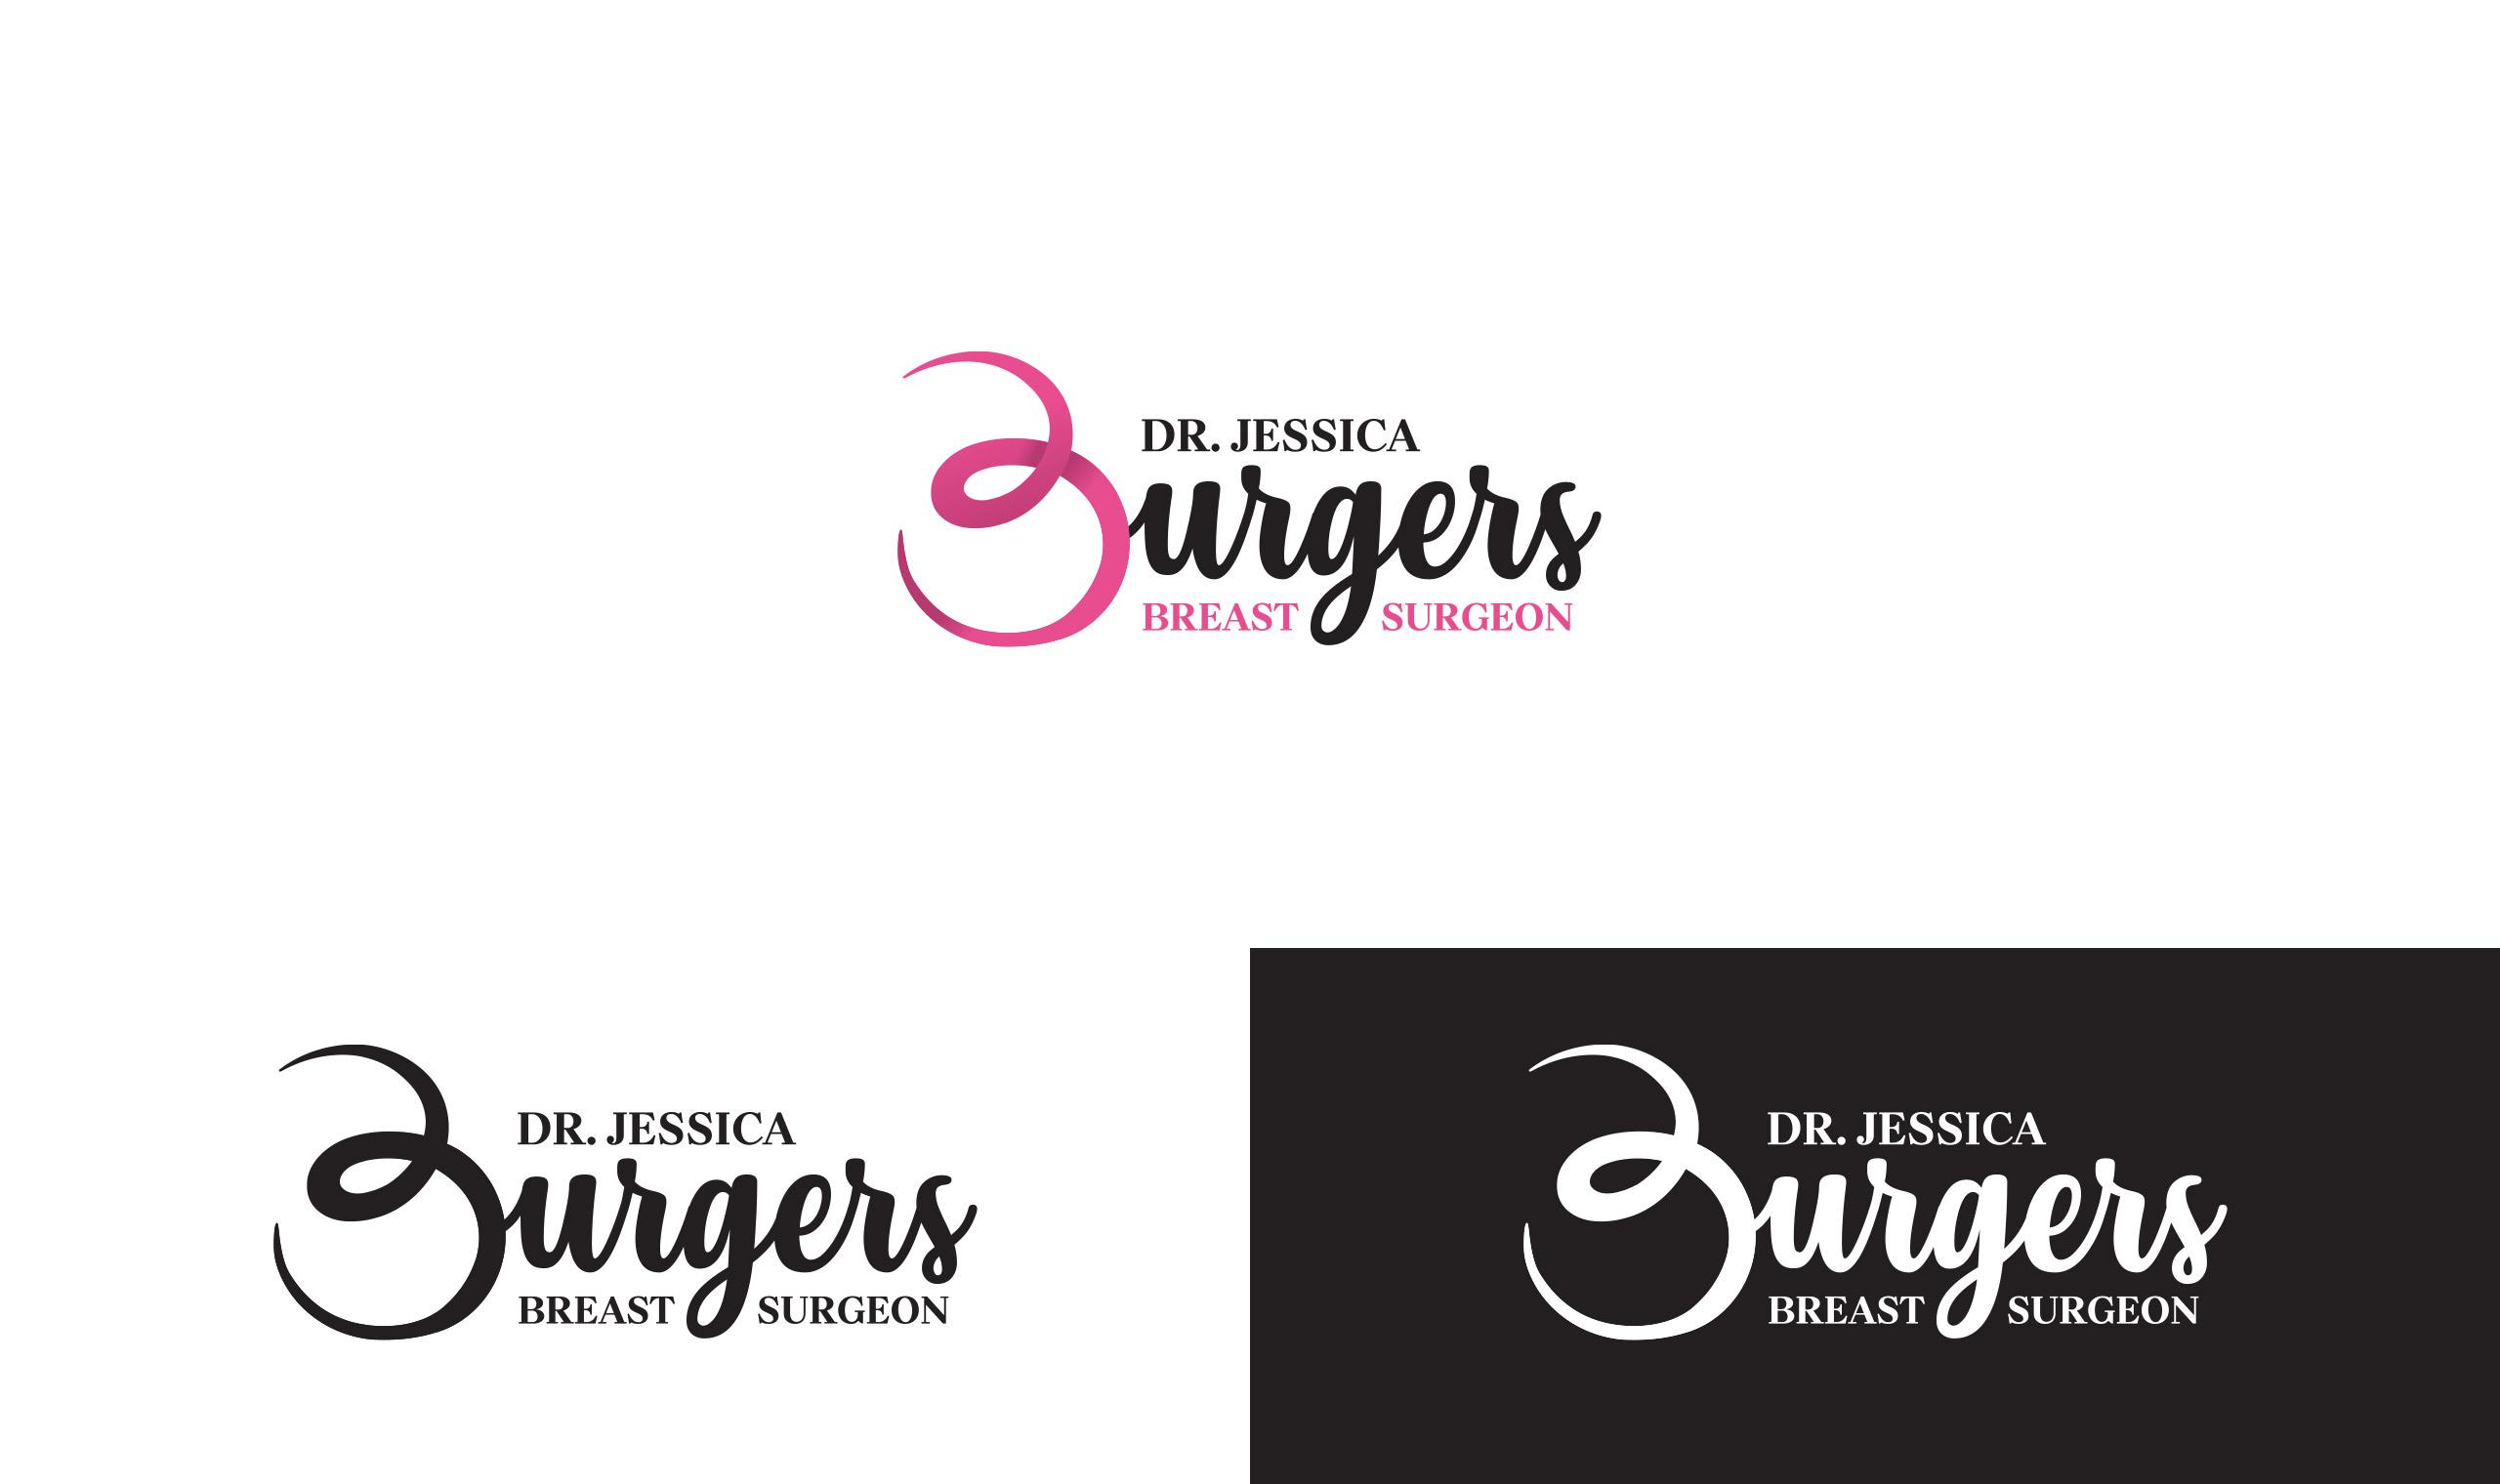 Dr. Jessica Burgers